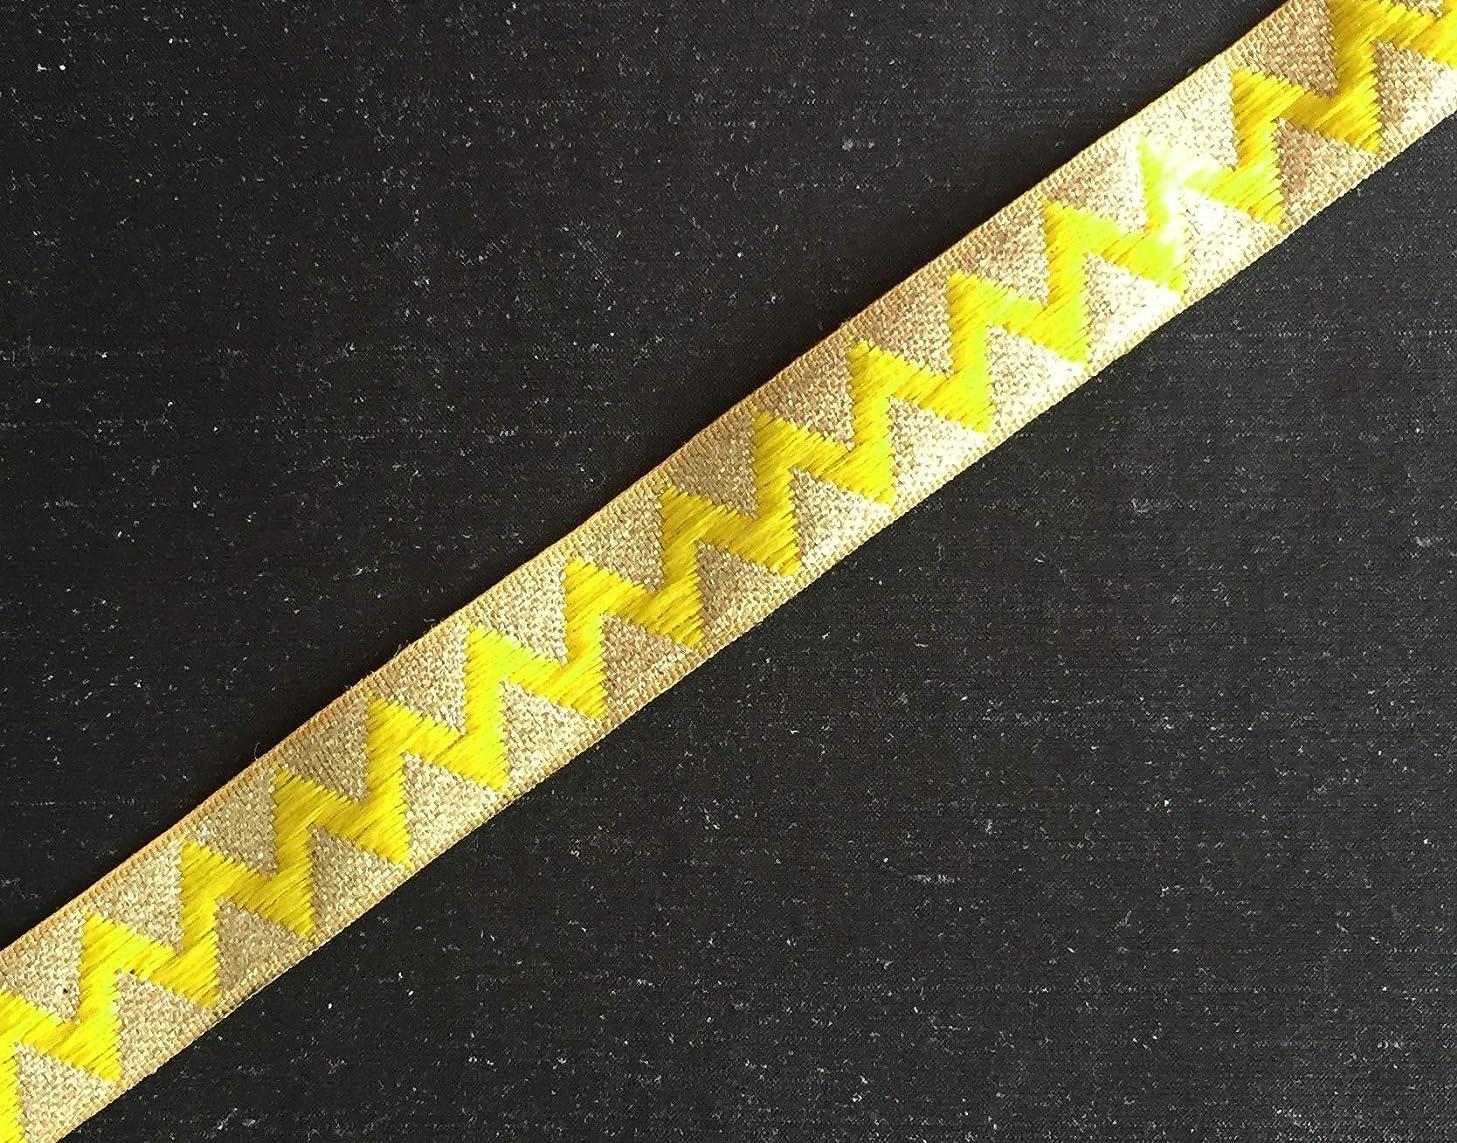 Yellow and Gold Chevron Brocade Style Sari Trim 3 Yards by Craftbot